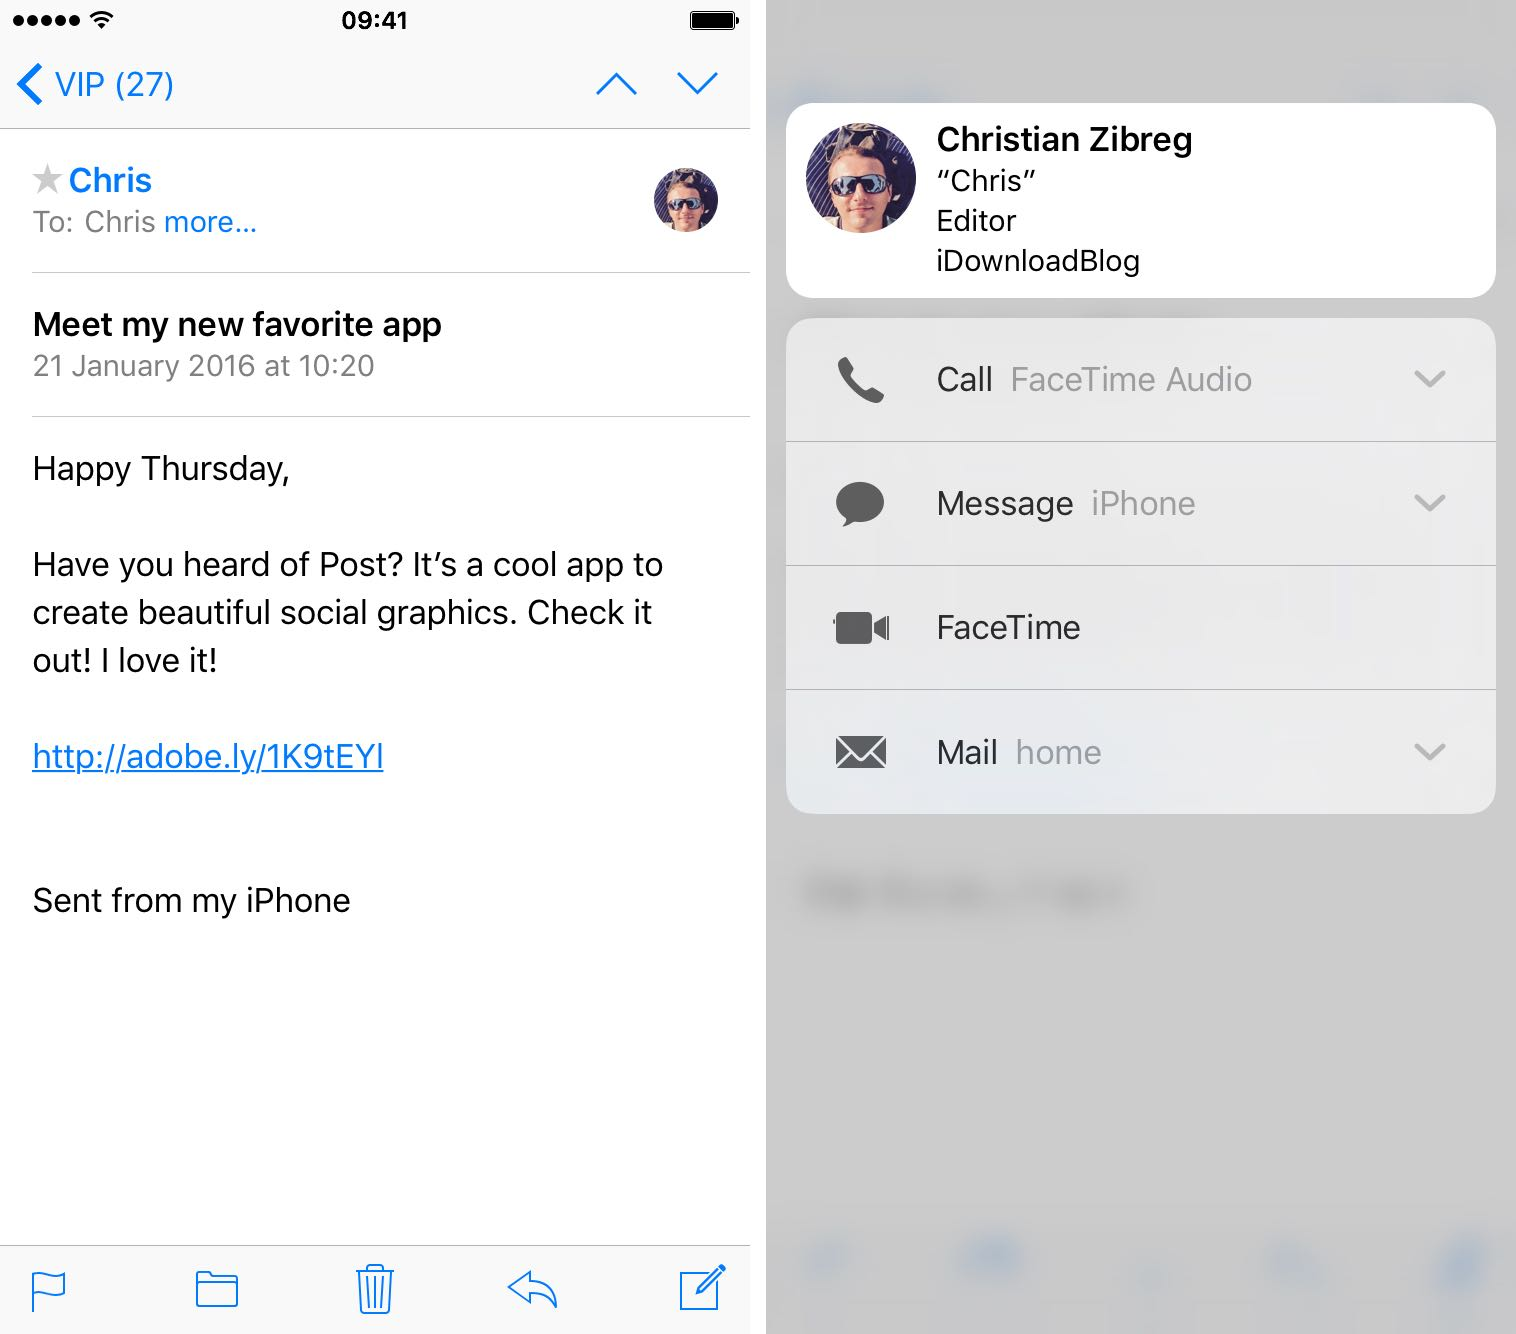 Vista previa de iOS 9 Mail 3D Touch contactos iPhone 6s captura de pantalla 008